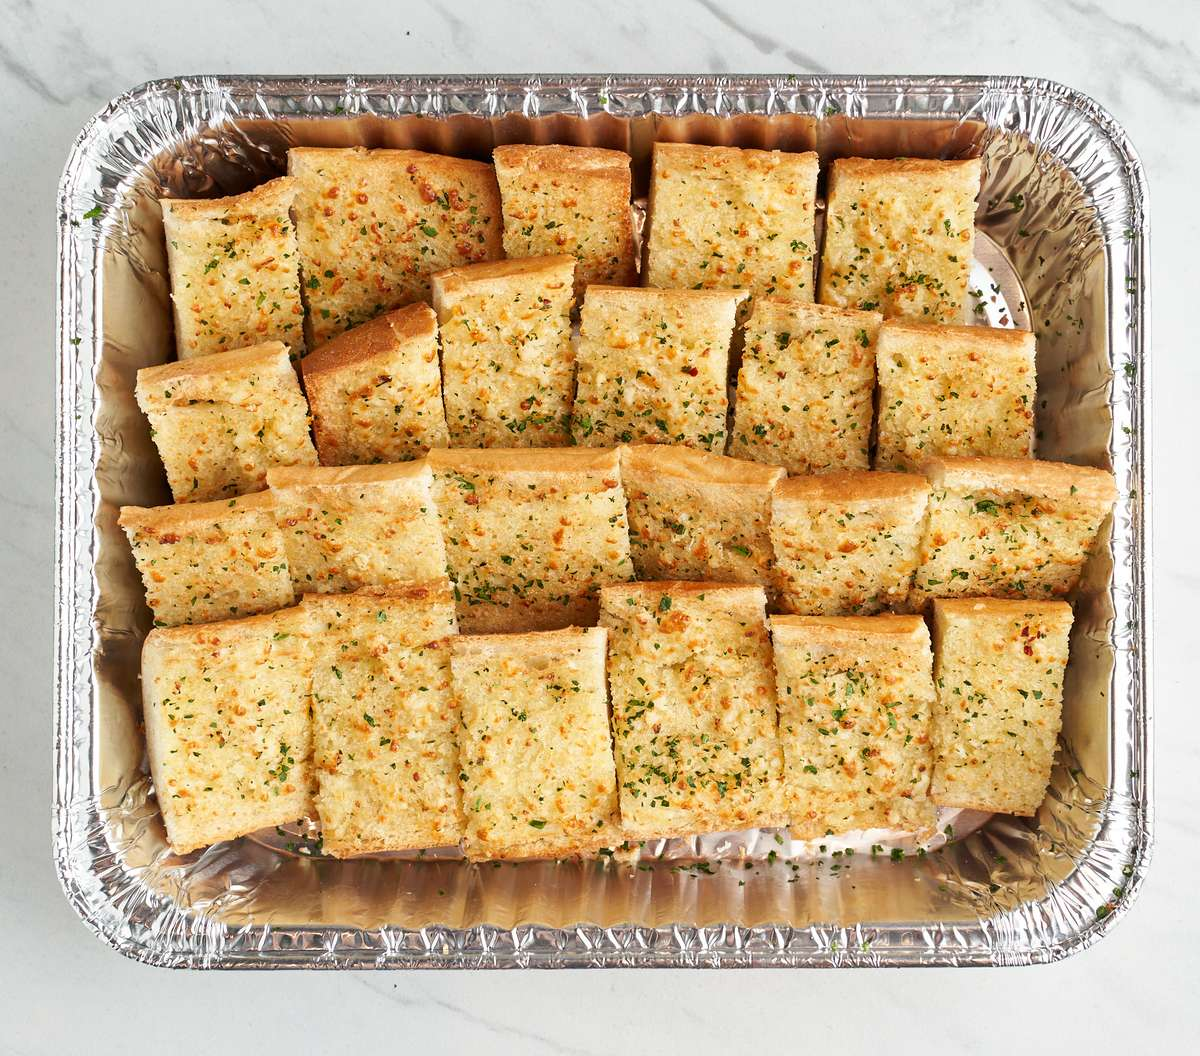 Catering Garlic Bread & Housemade Marinara